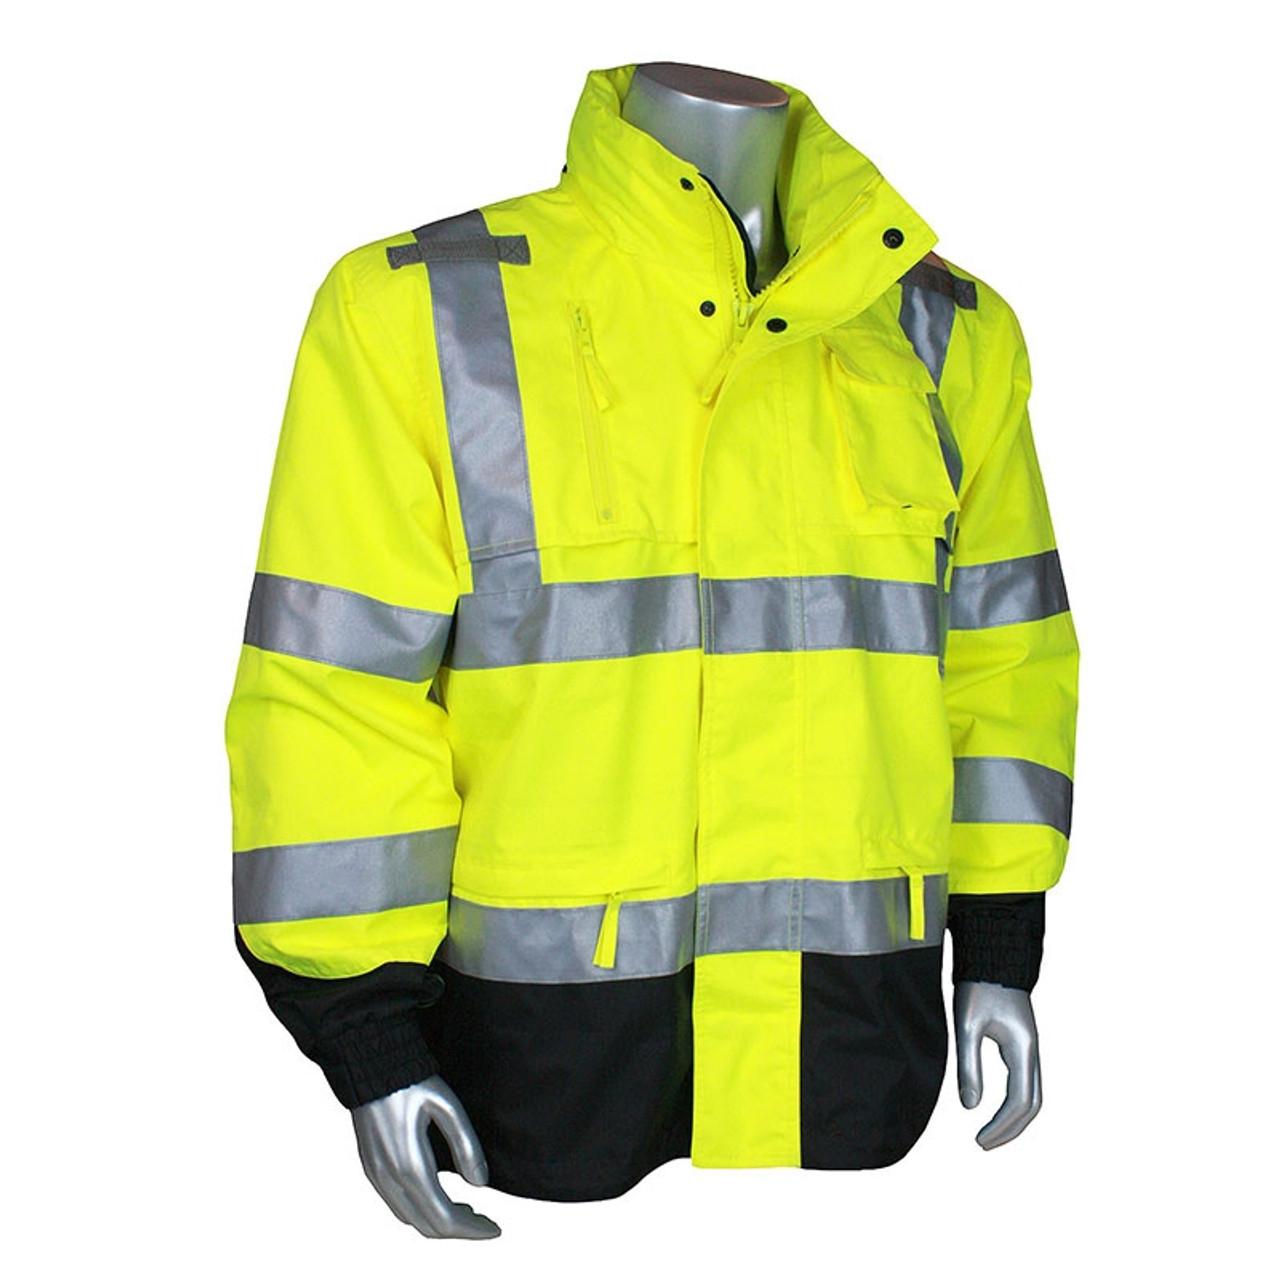 a1ef0f101 Radians Class 3 Hi Vis Yellow Rip Stop Waterproof Rain Jacket RW32-3Z1Y  Front